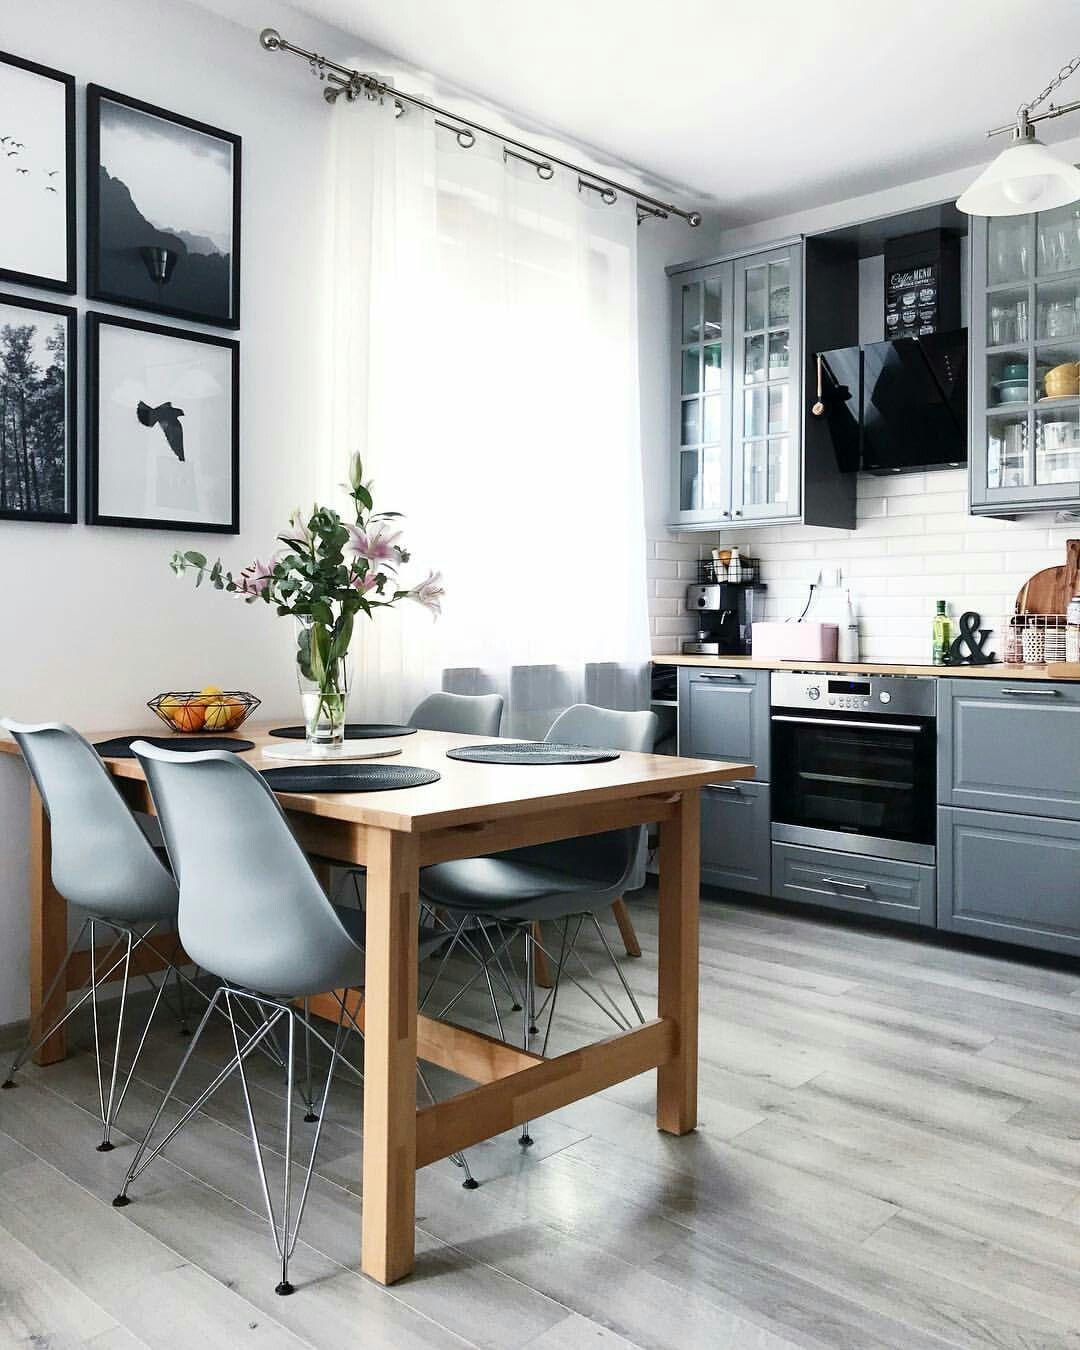 Incredible Kitchen Remodeling Ideas: 9 Sleek & Inspiring Luxury Kitchen Design Ideas Photos